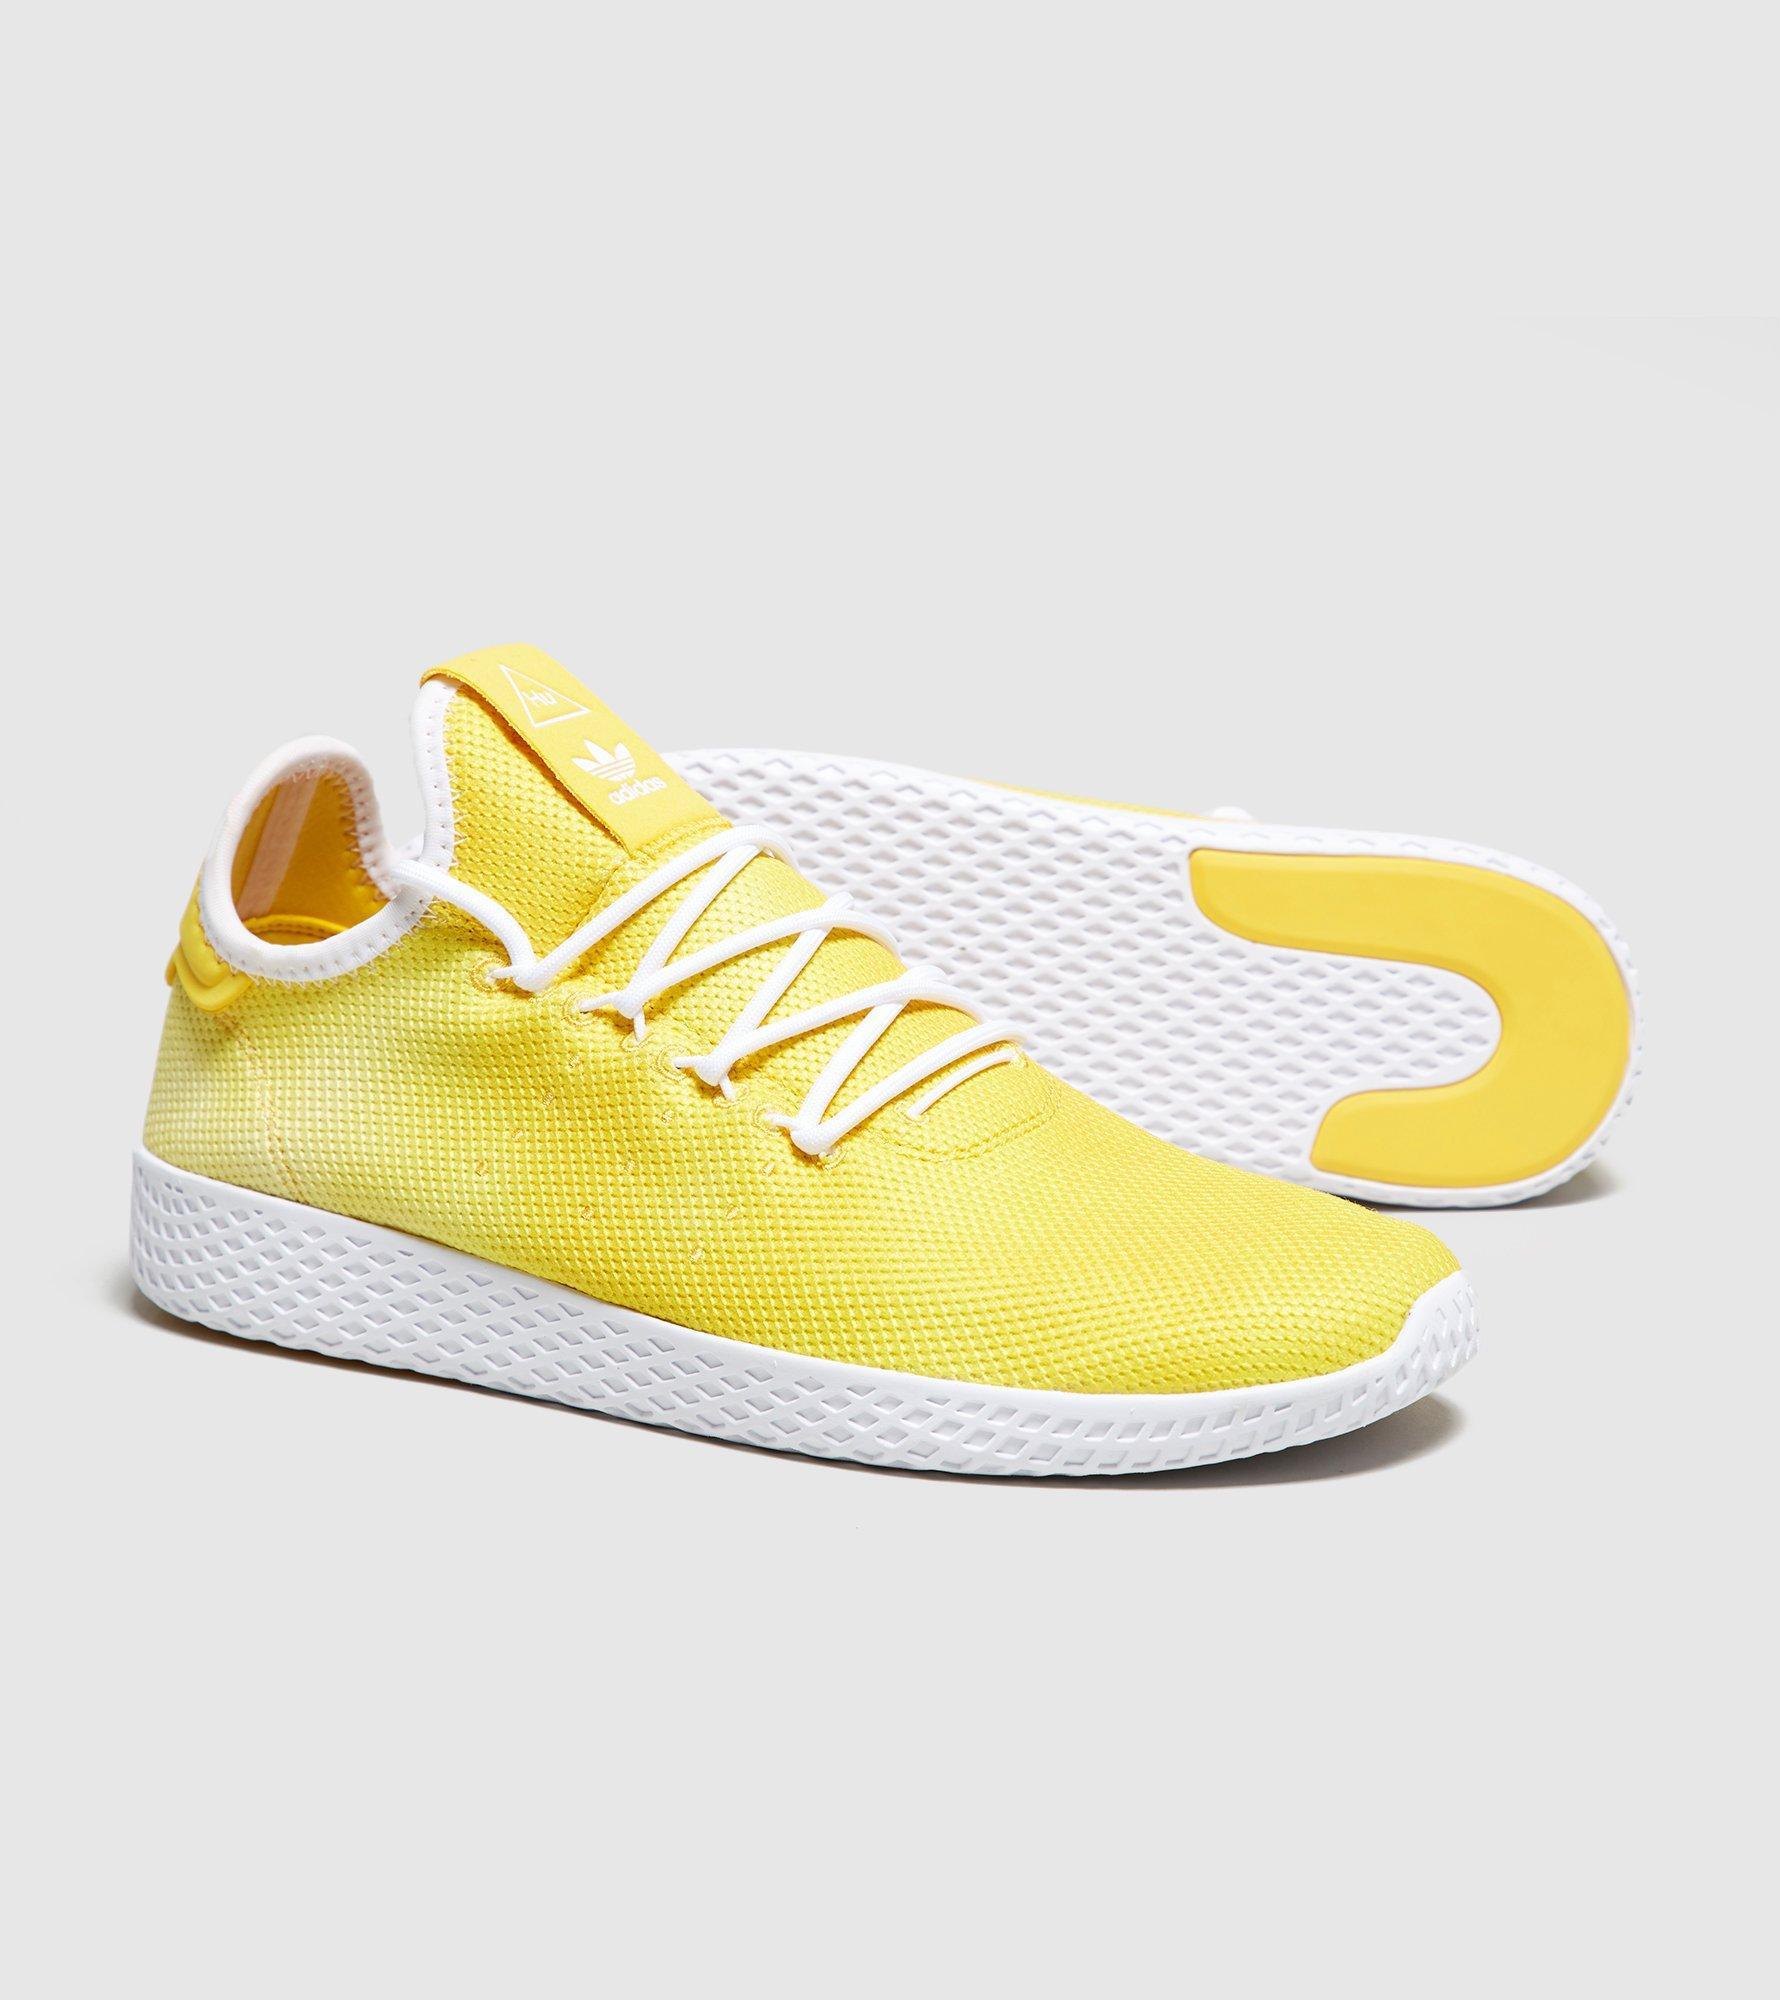 lyst adidas originali x pharrell williams holi tennis hu in giallo